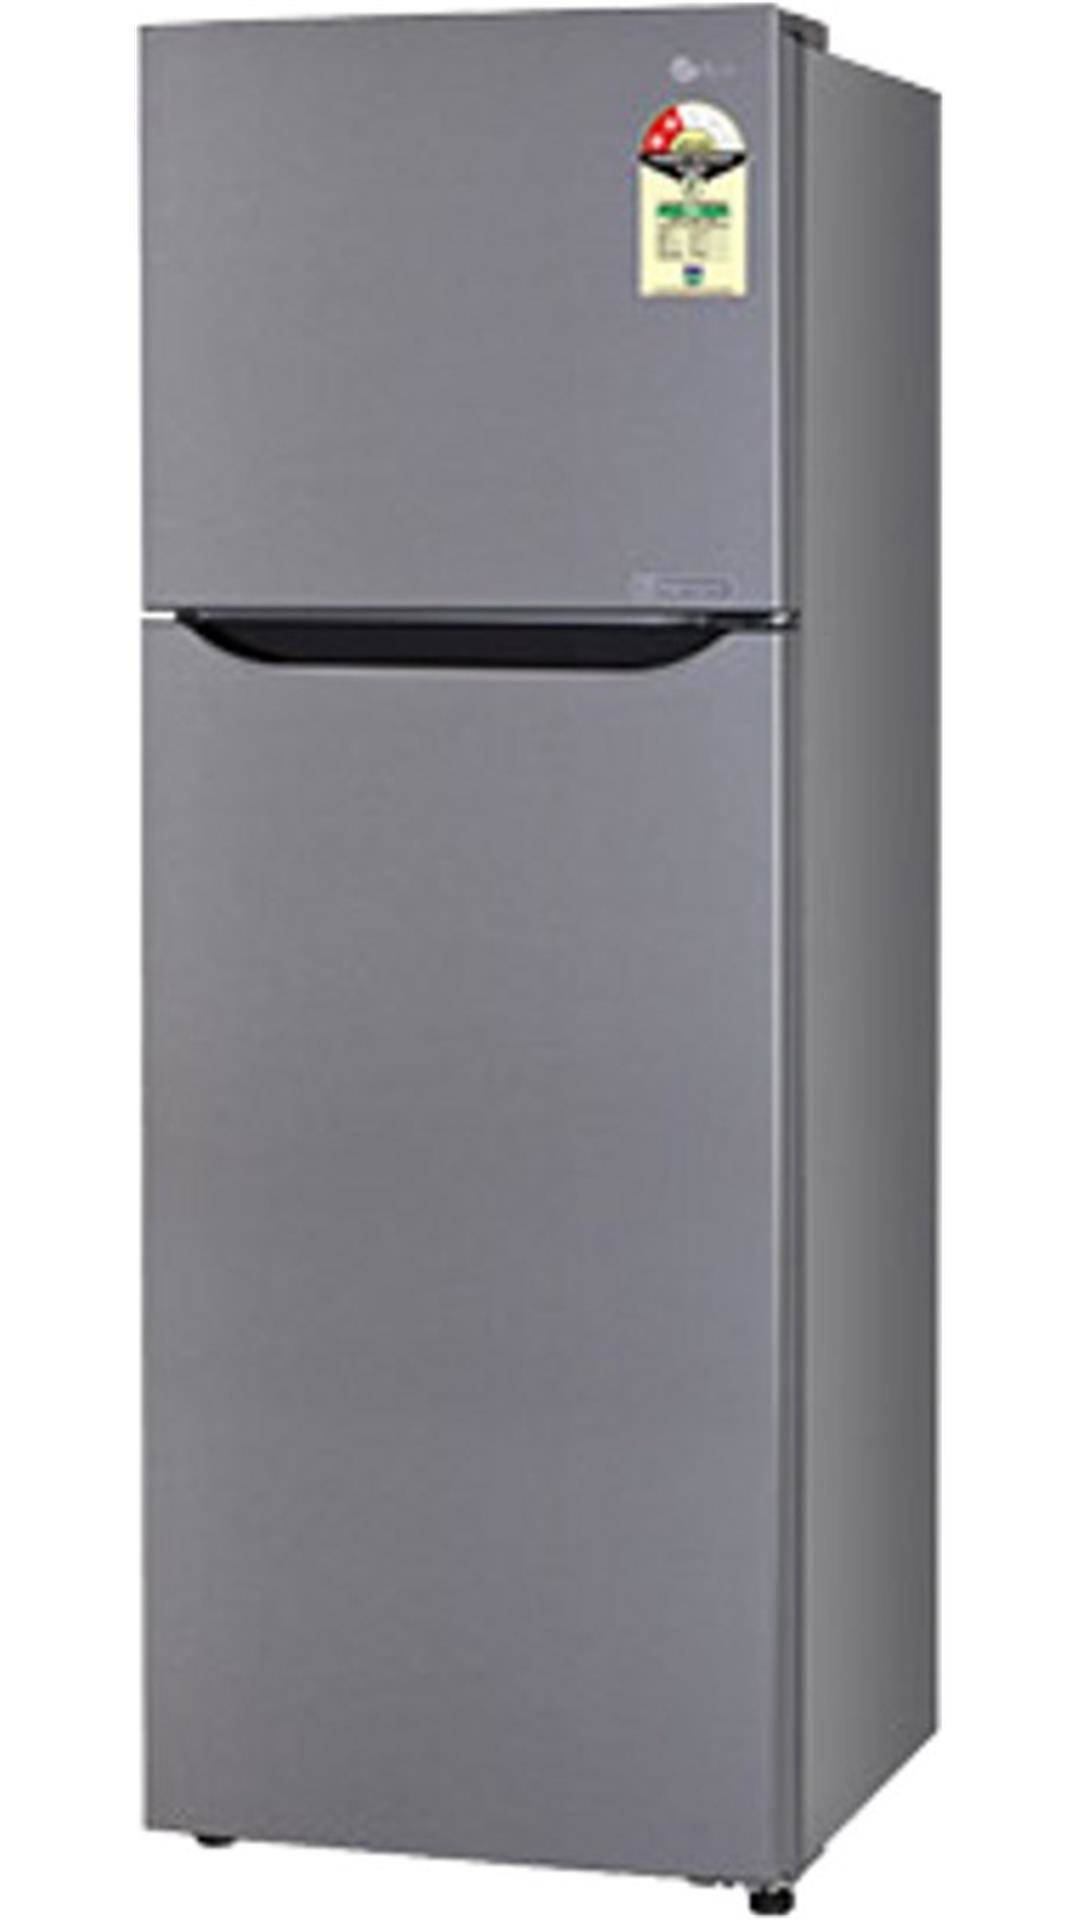 LG GL-I292RPZL Frost Free Double Door Refrigerator - LG GL